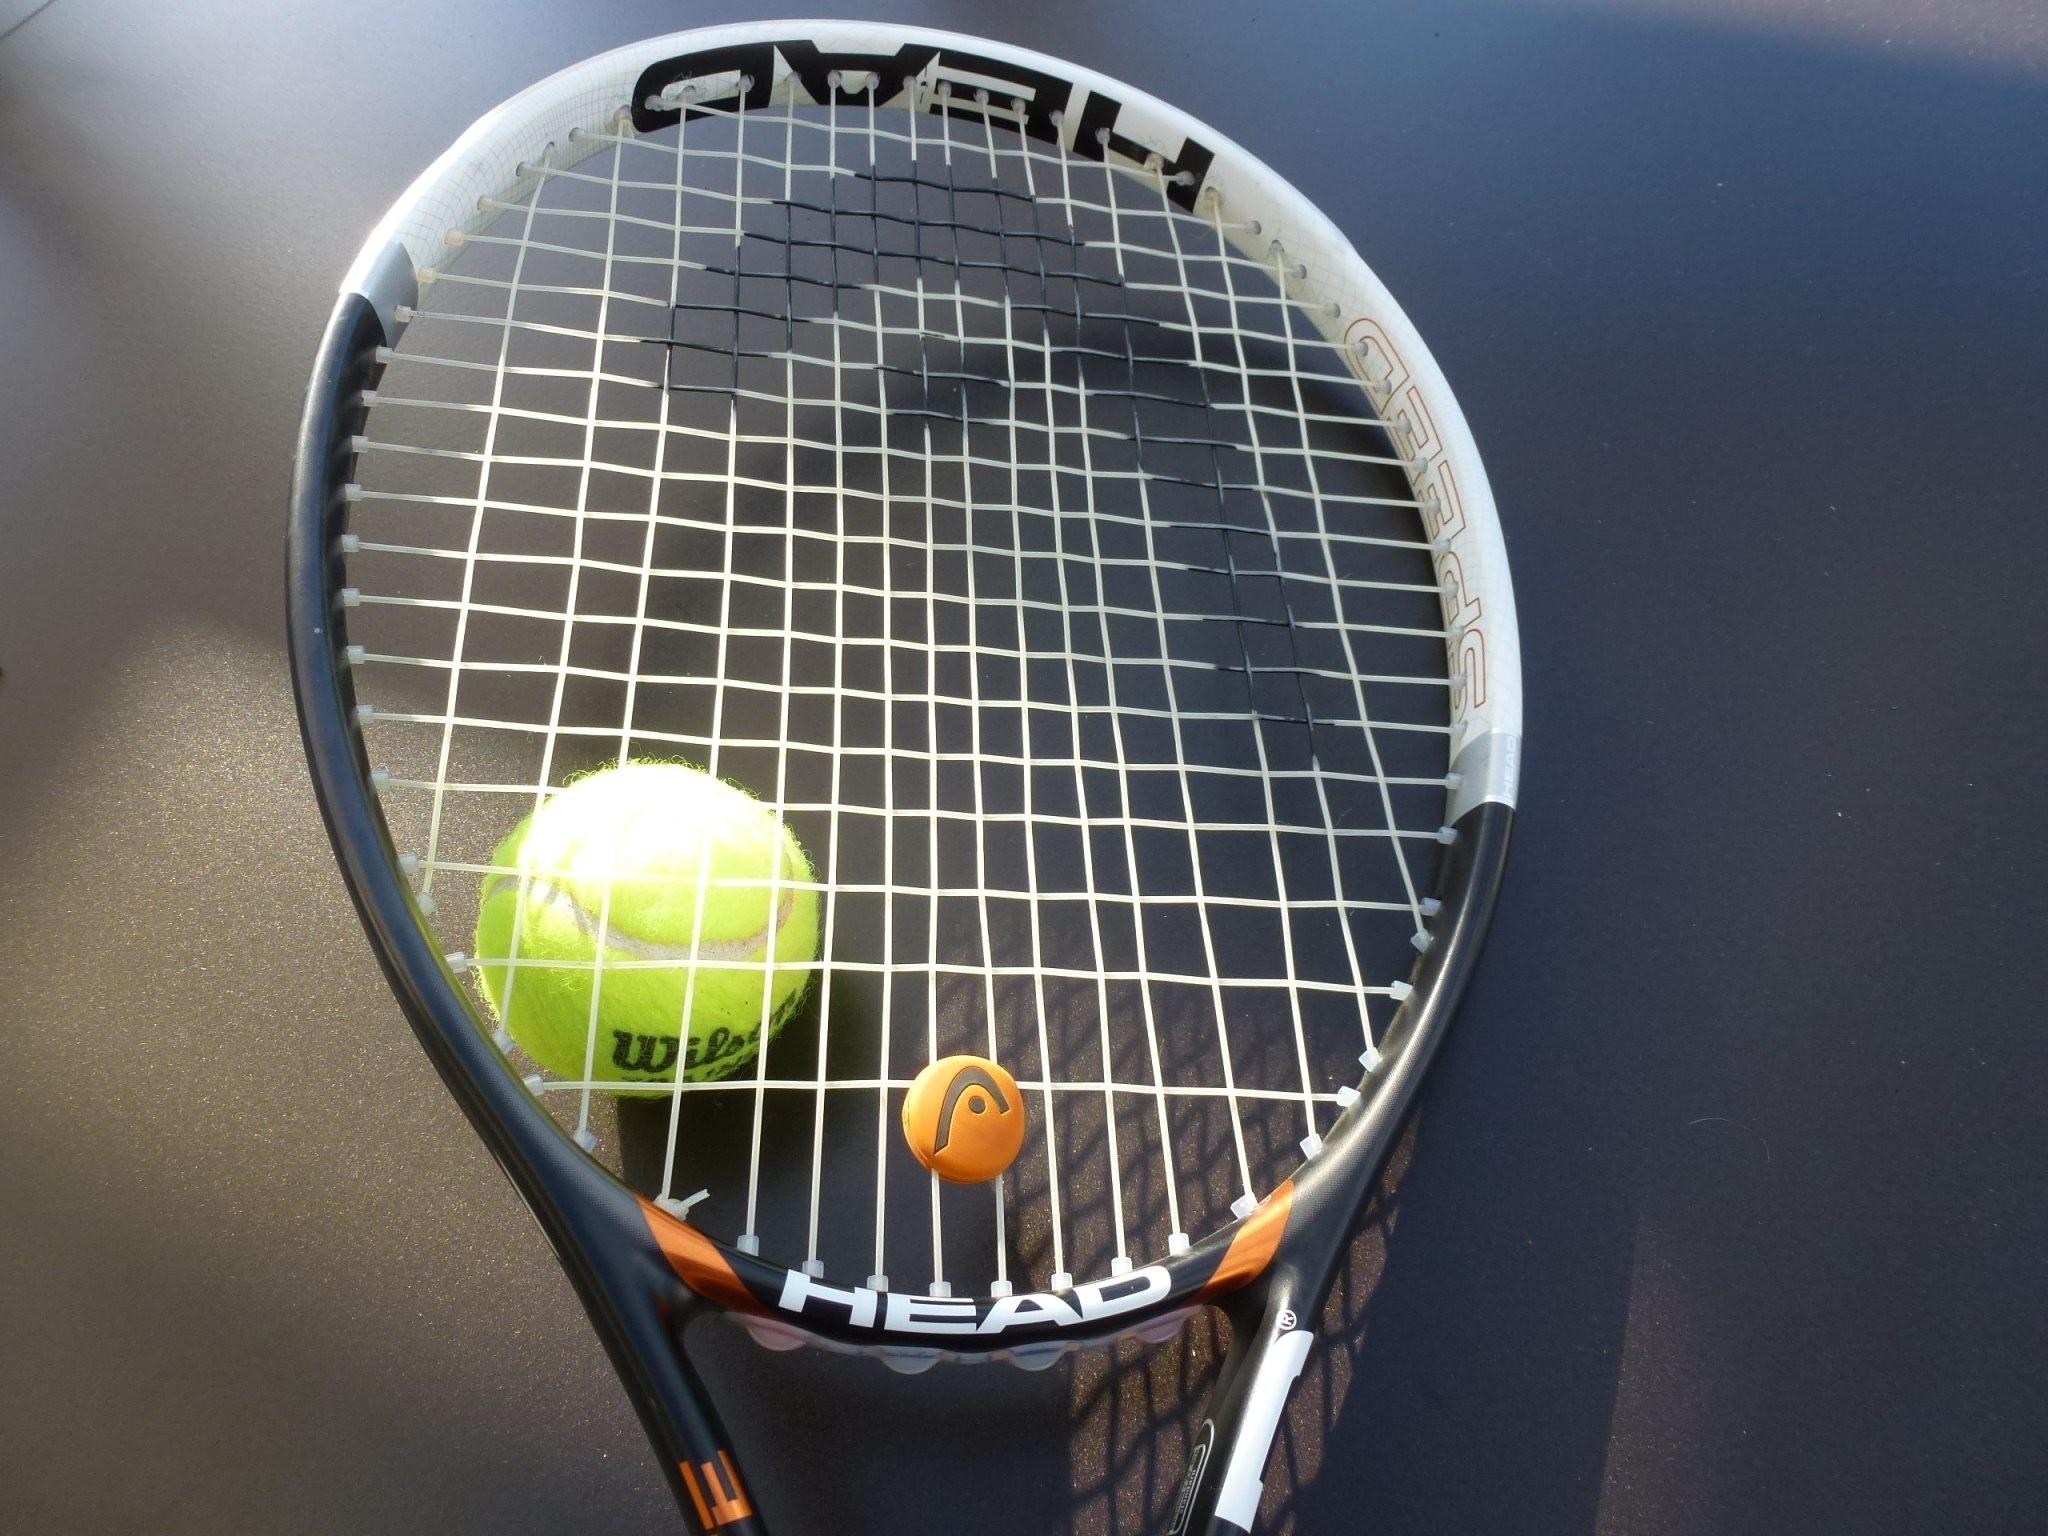 Tennis Ball and Racket Wallpaper Photos 59880